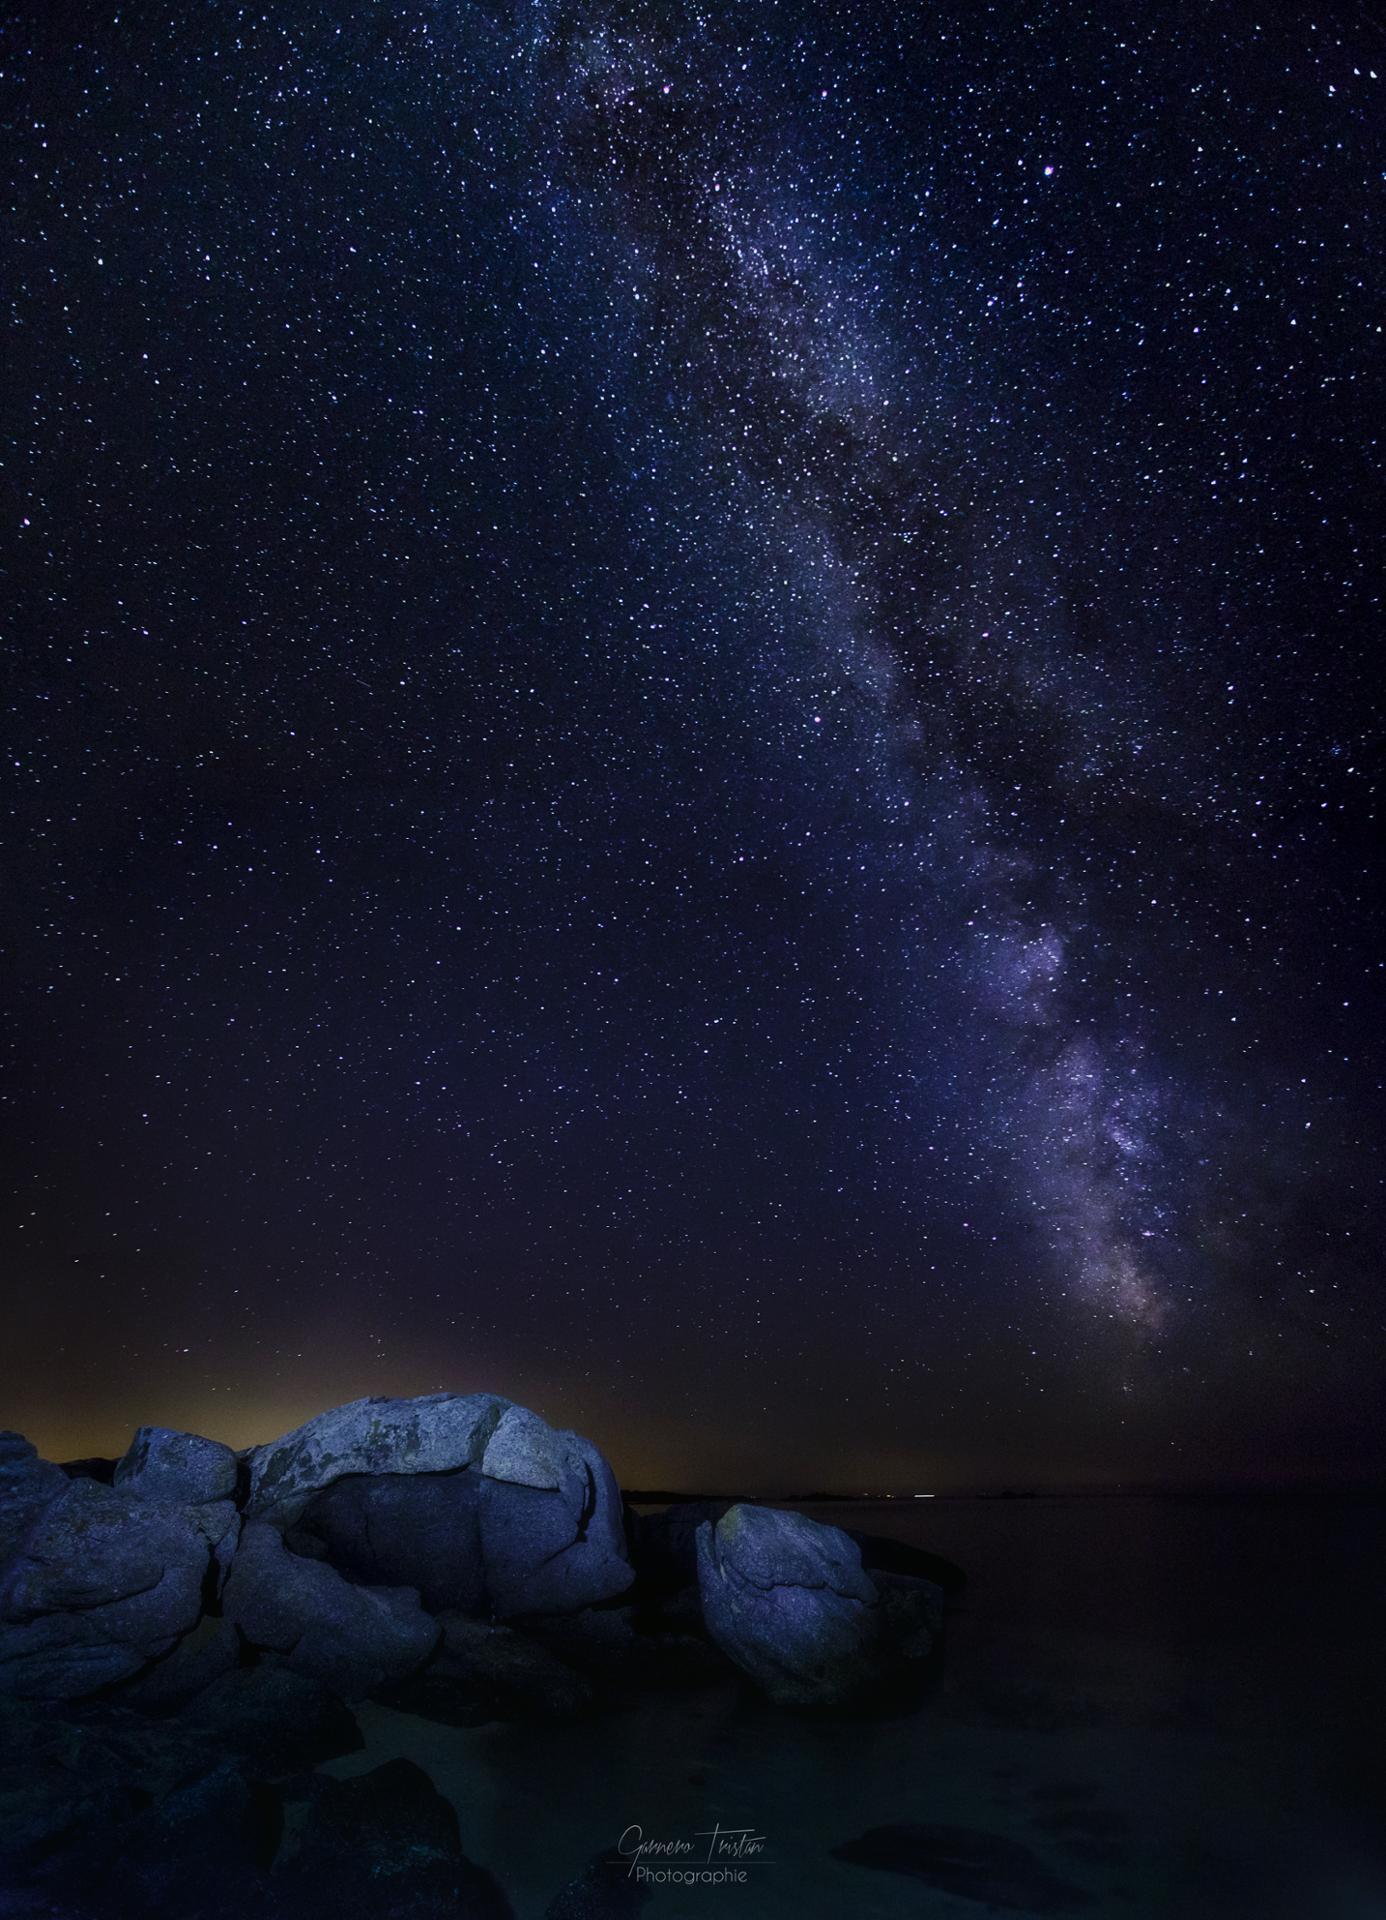 Corsican Milky Way